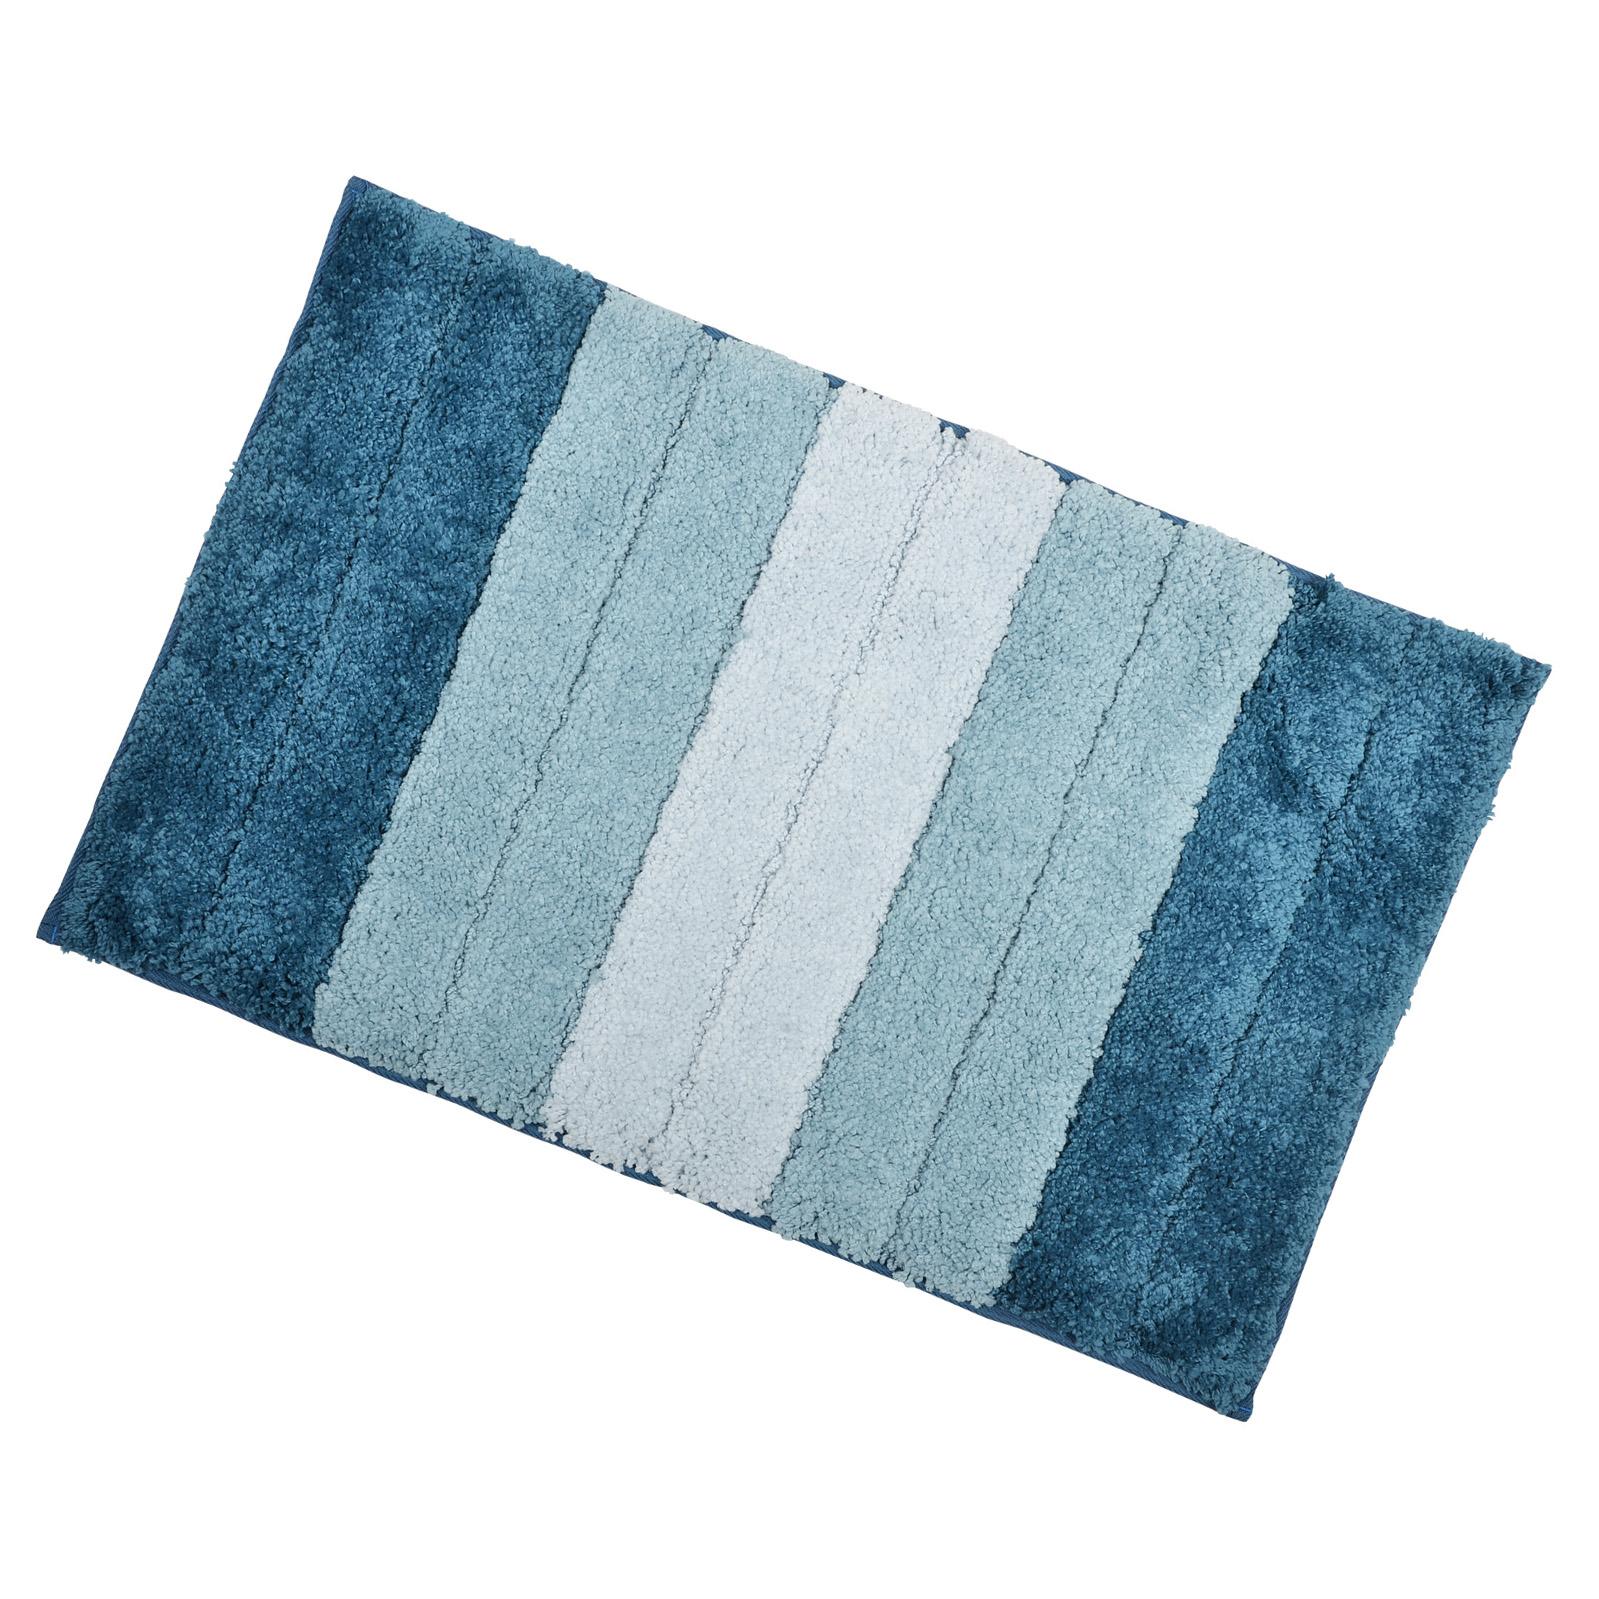 soft tufted microfibre bathroom shower bath mat rug non slip back 12 colours. Black Bedroom Furniture Sets. Home Design Ideas